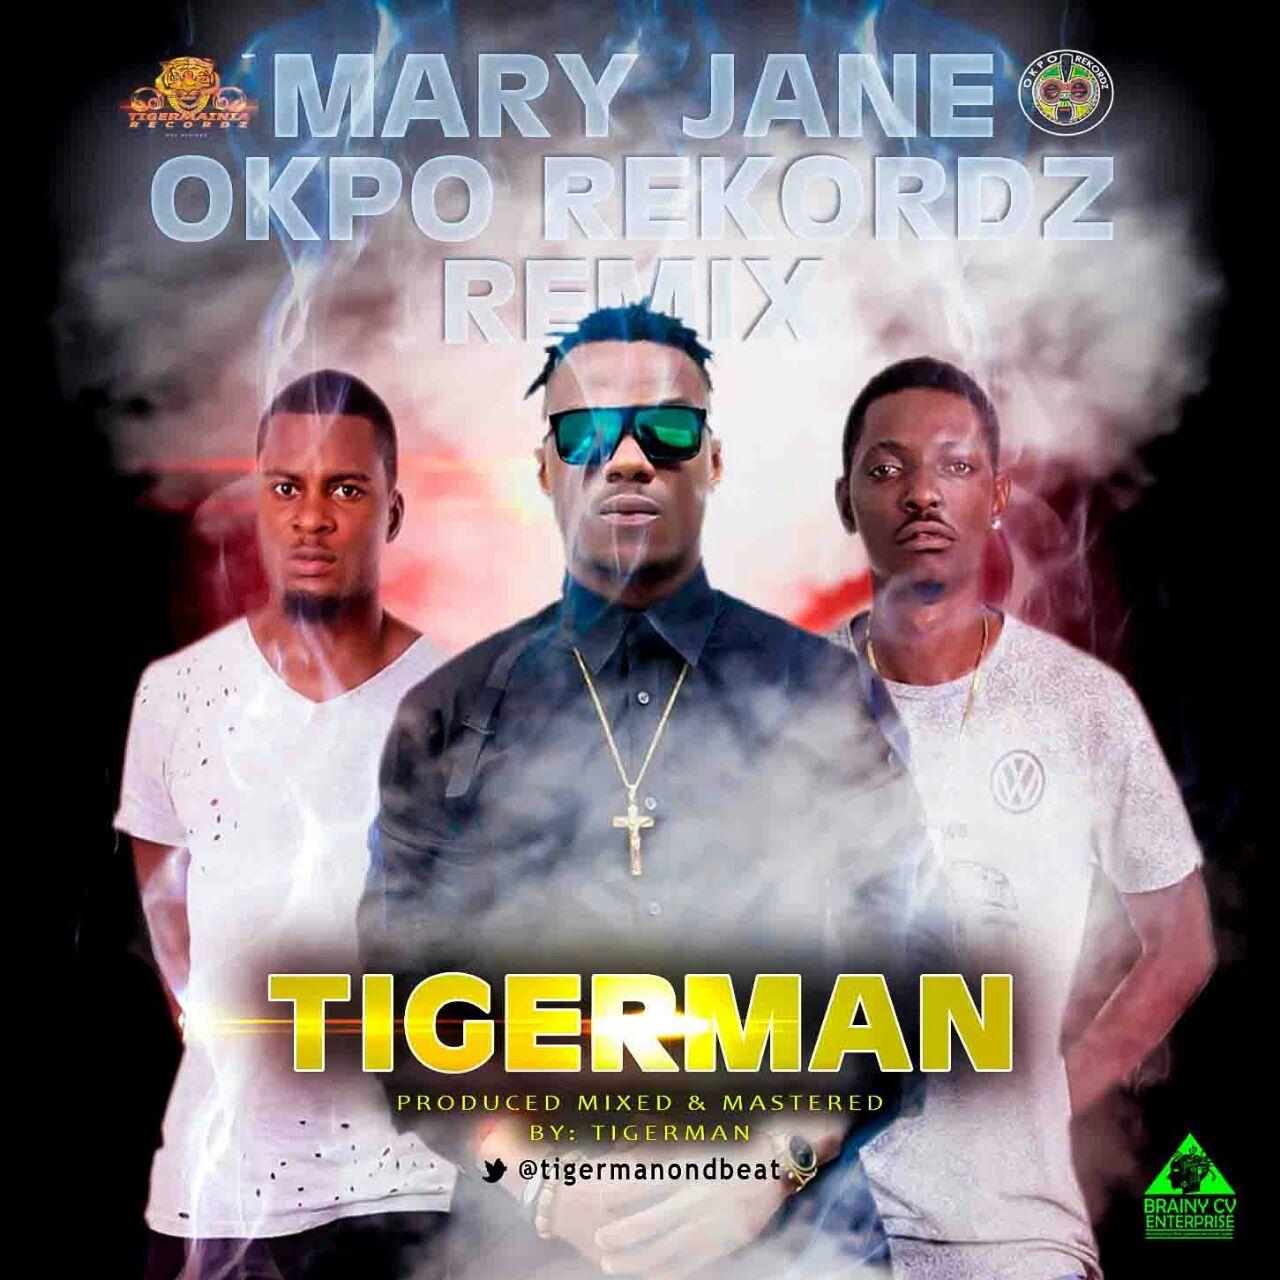 New Musik: Tigerman @Tigermanondbeat Ft Okpo Records